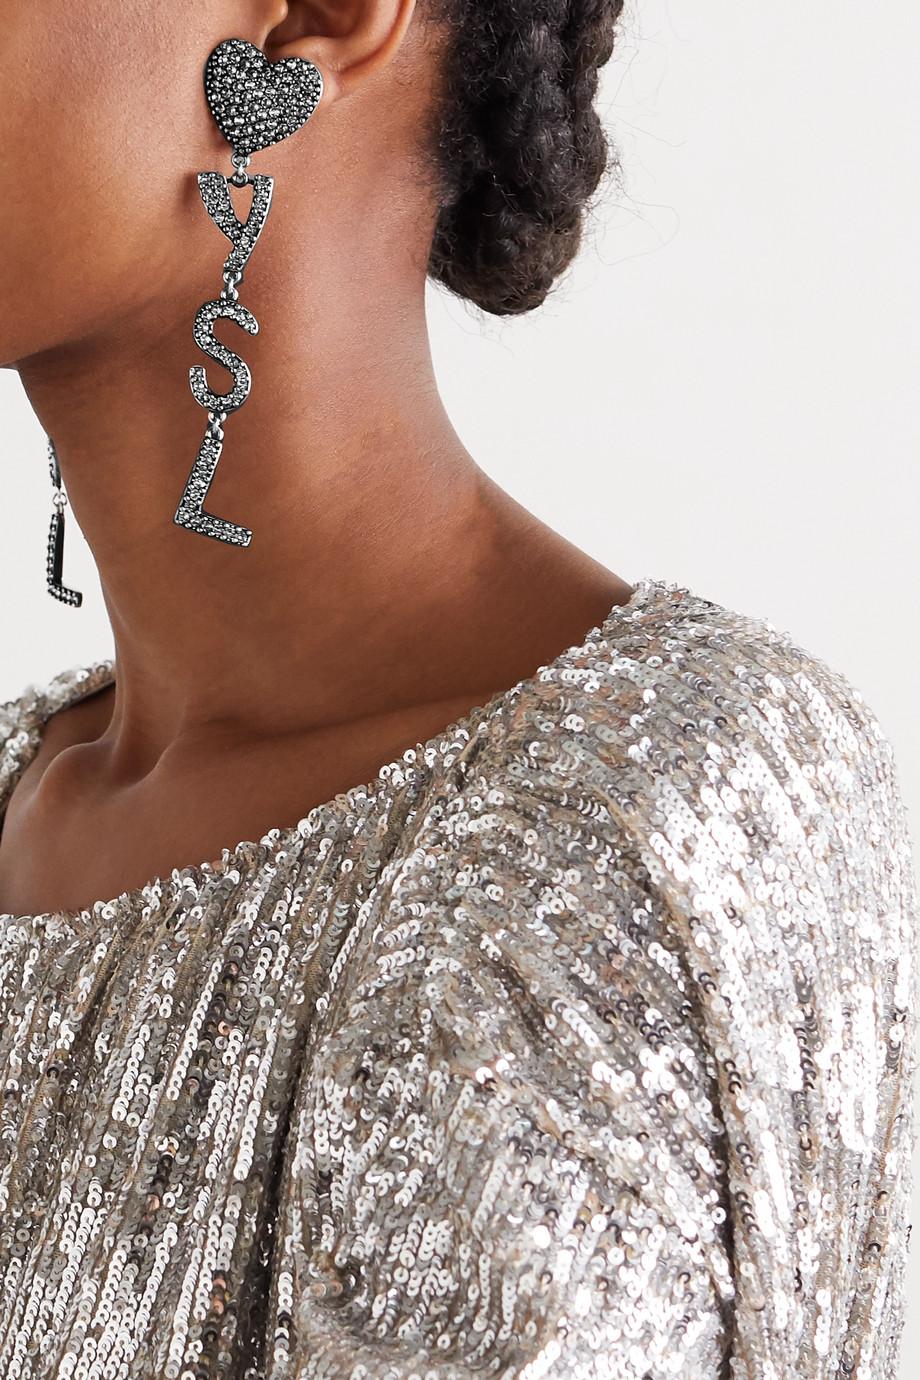 SAINT LAURENT Silberfarbene Ohrclips mit Kristallen